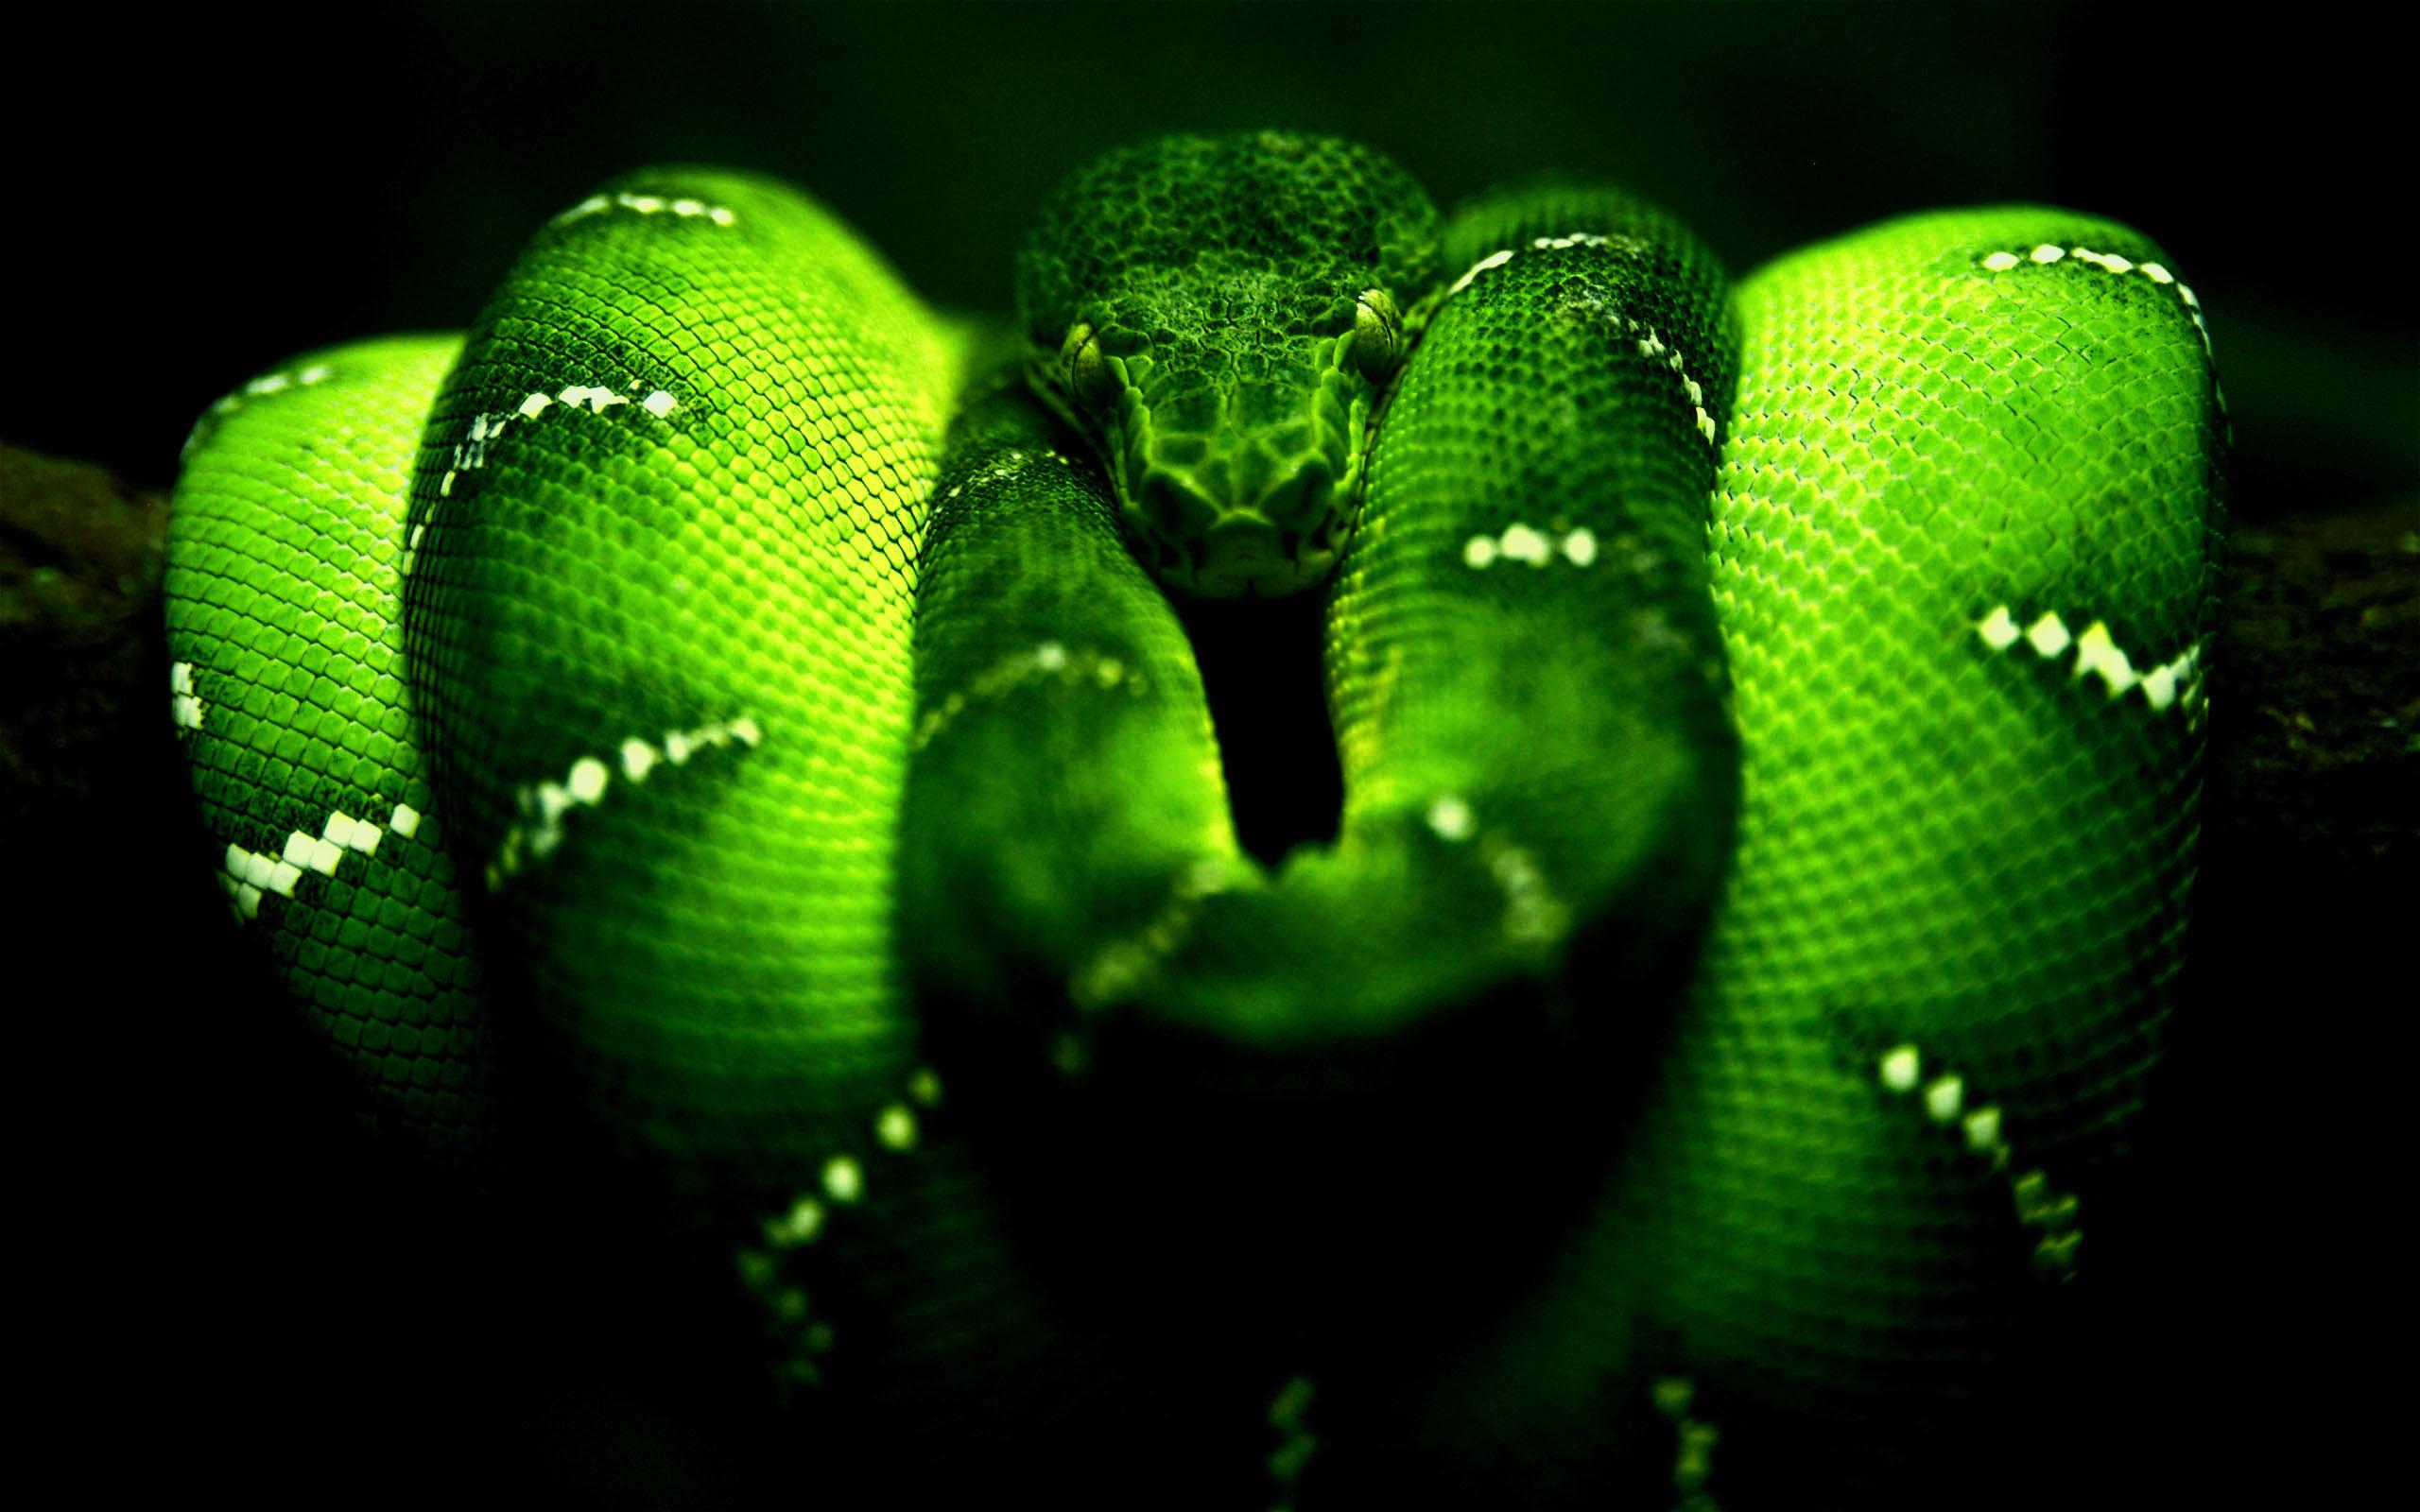 Black Snake Wallpaper (60+ images)